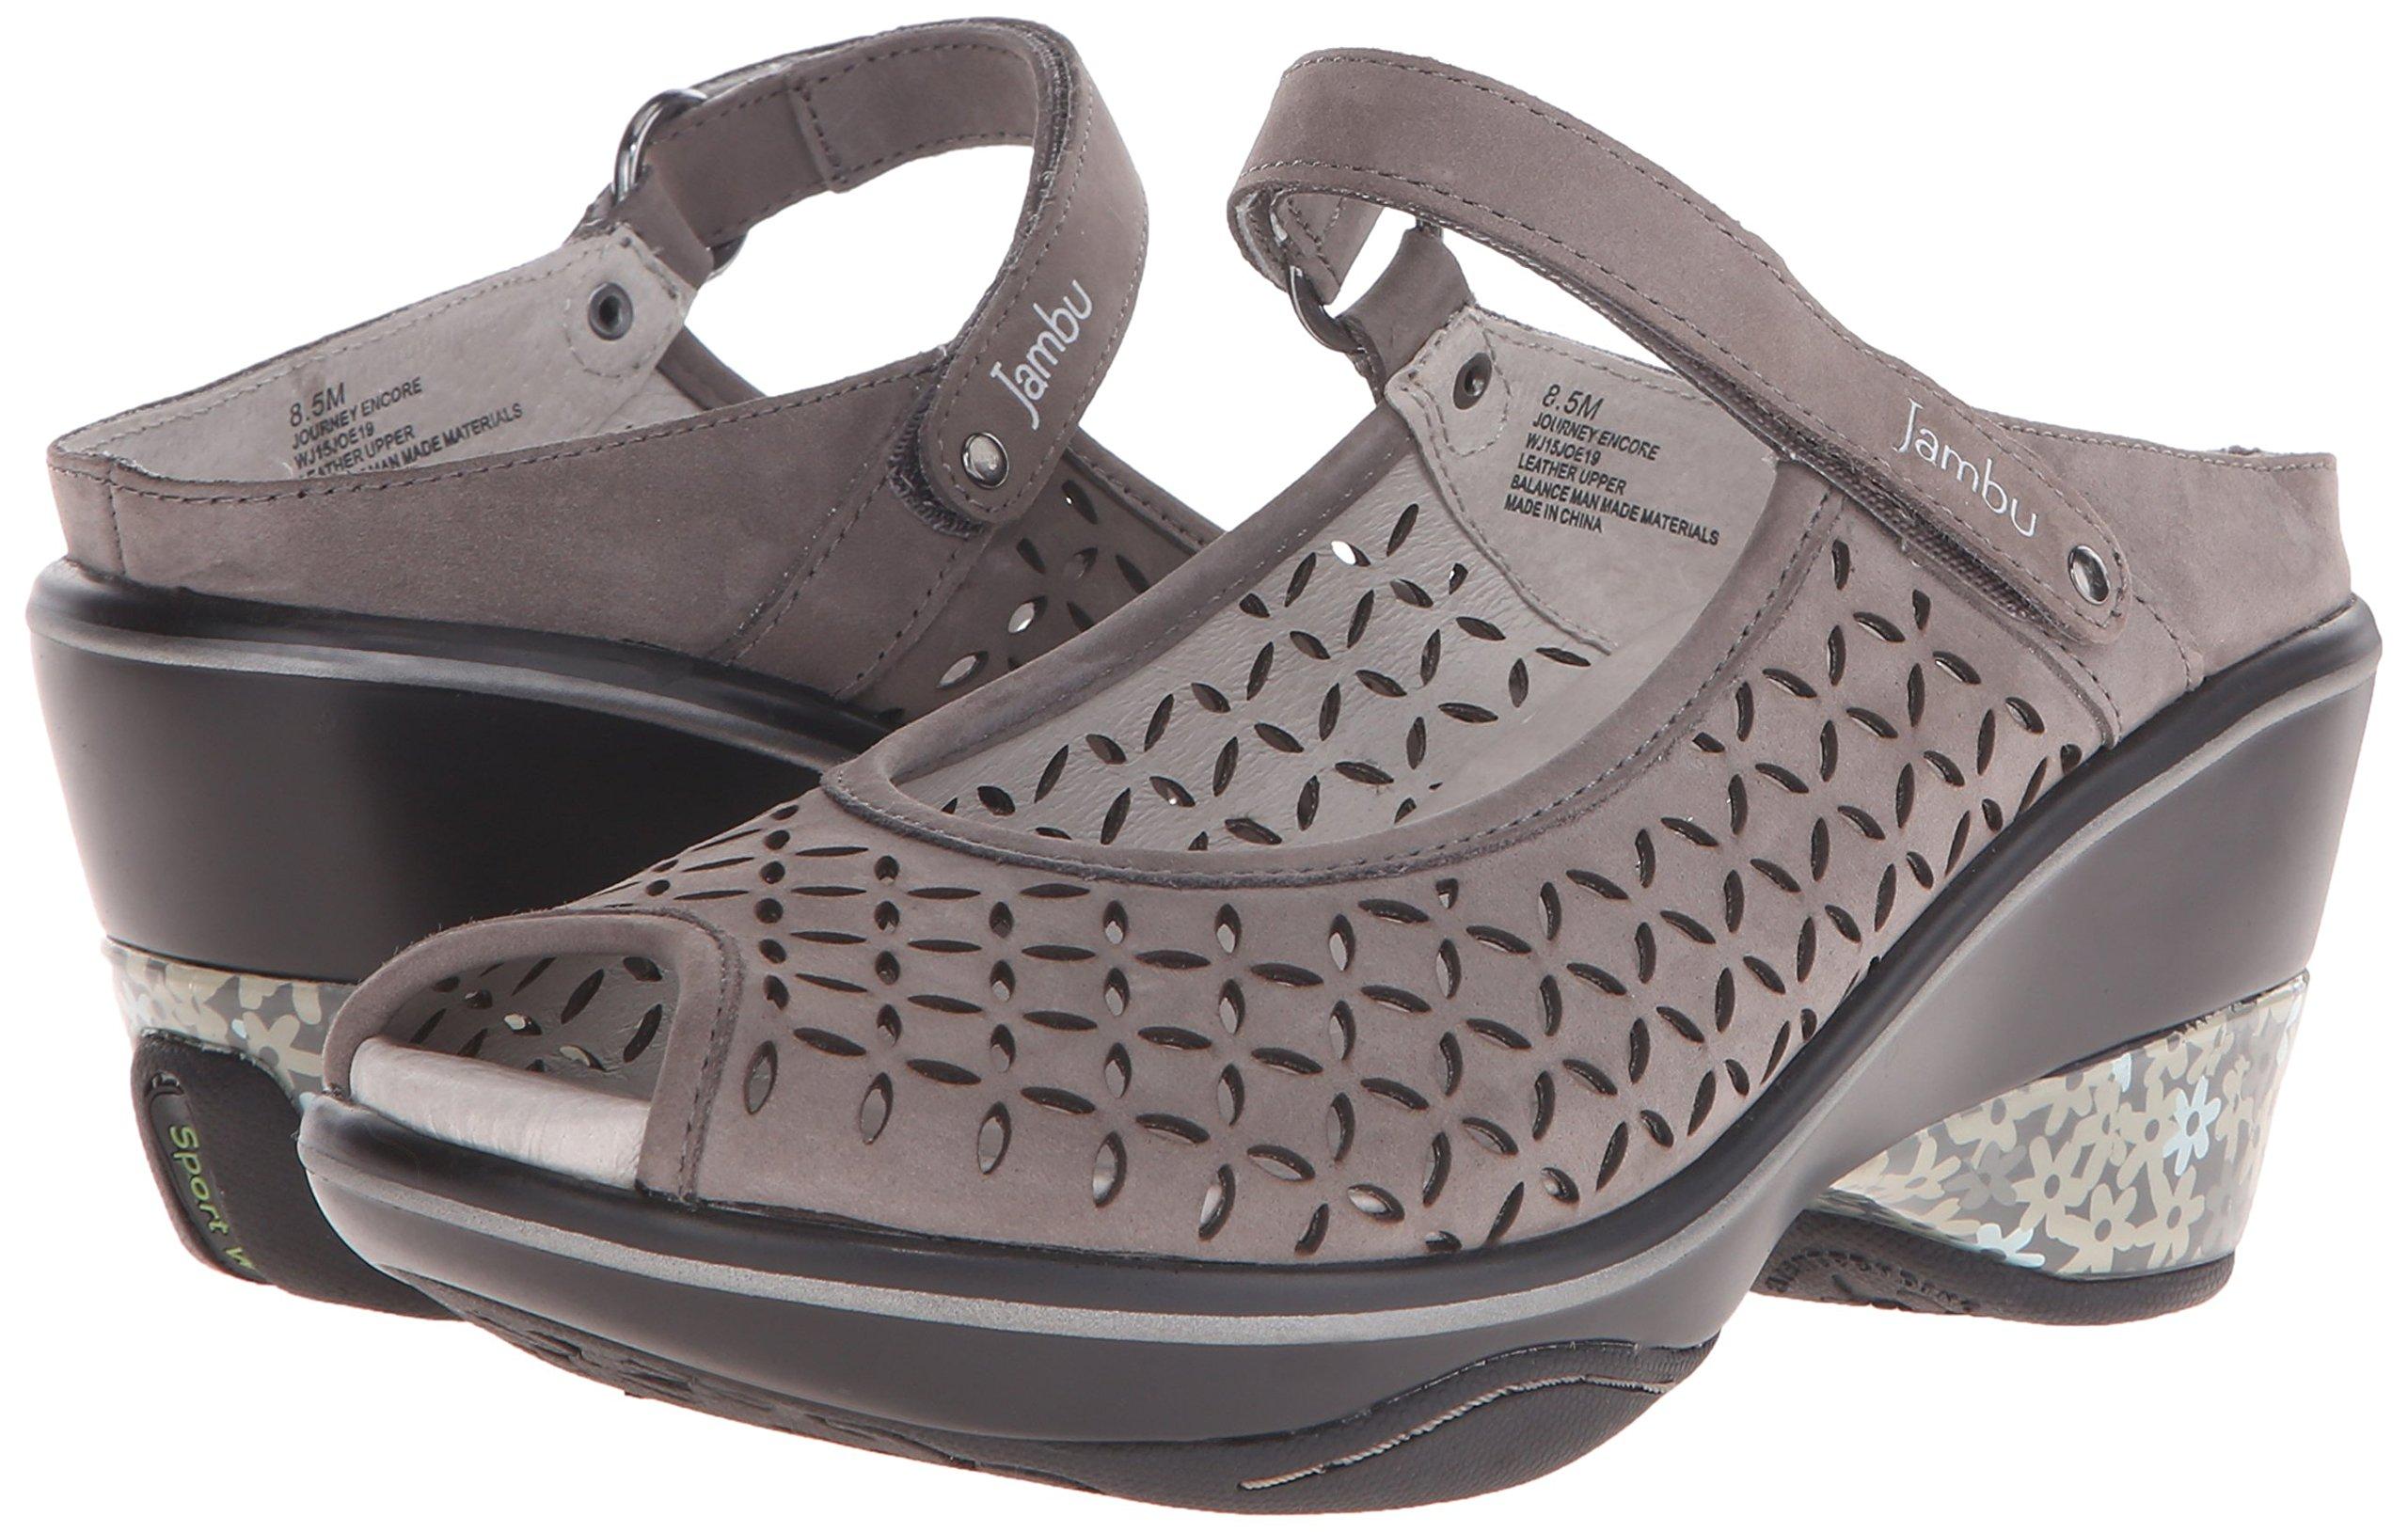 Jambu Women's Journey Encore Wedge Sandal, Dark Grey, 10 M US by Jambu (Image #6)